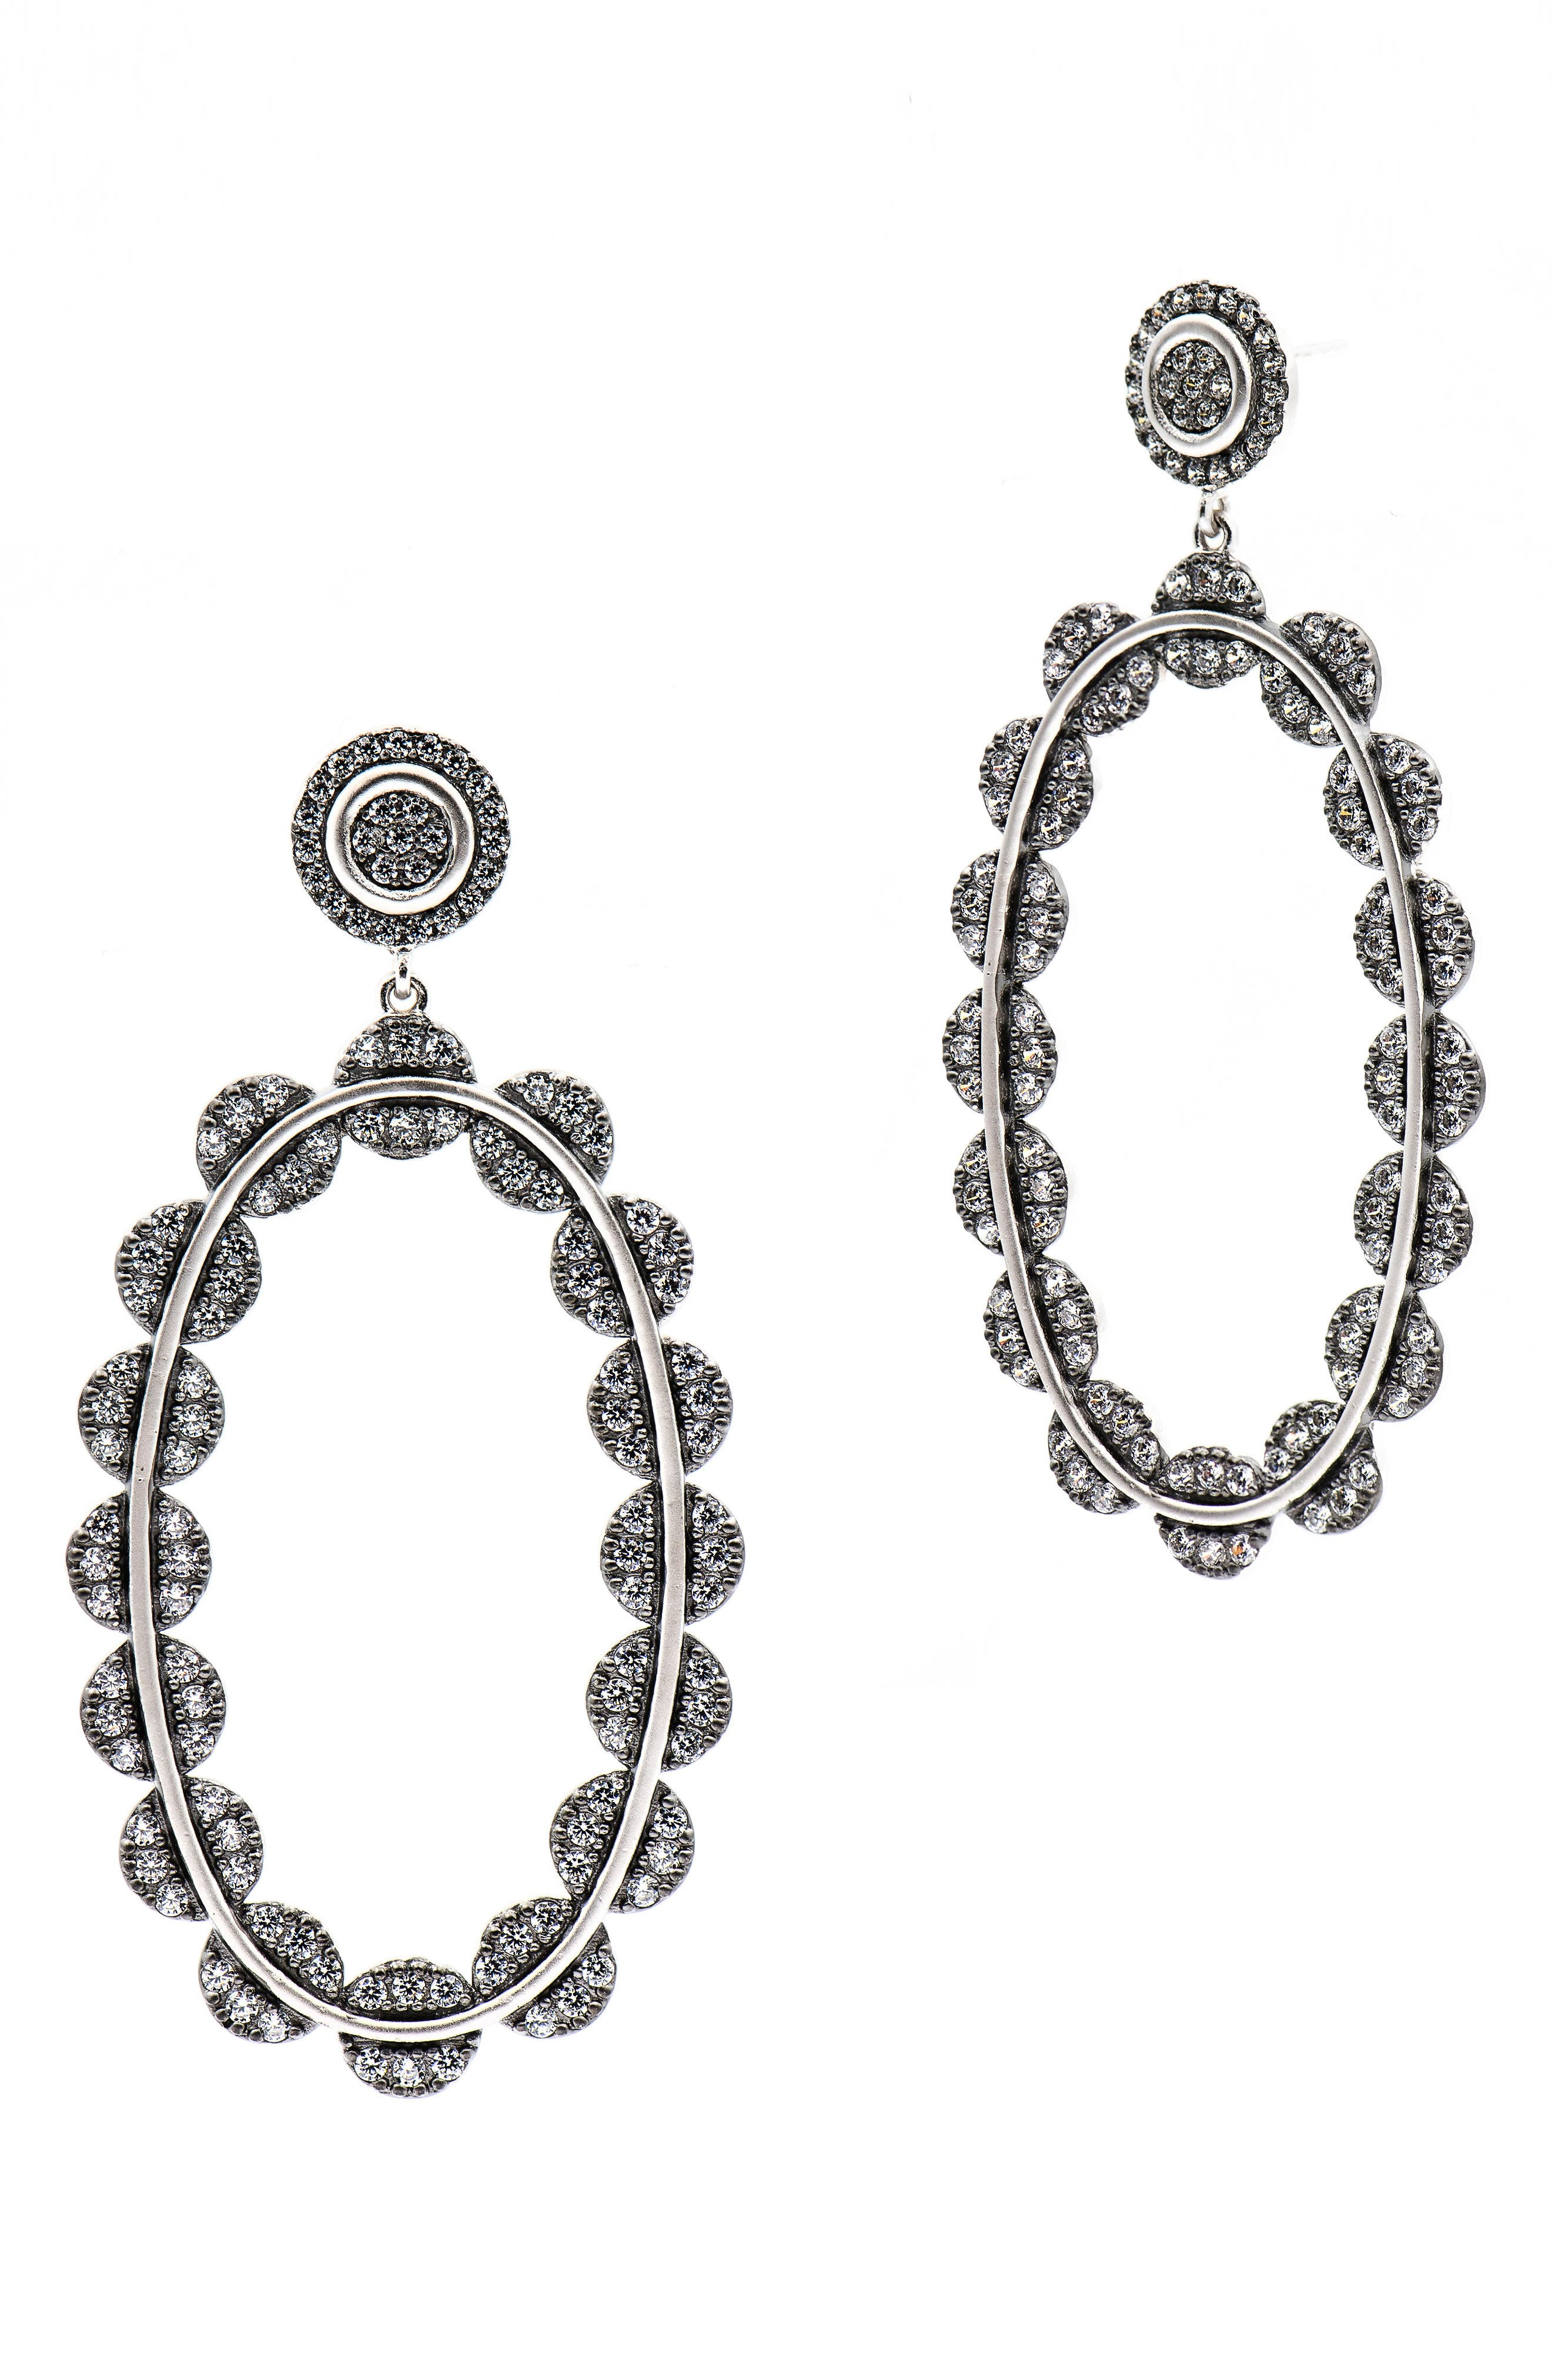 Cubic Zirconia Oval Drop Earrings,                         Main,                         color, BLACK/ SILVER